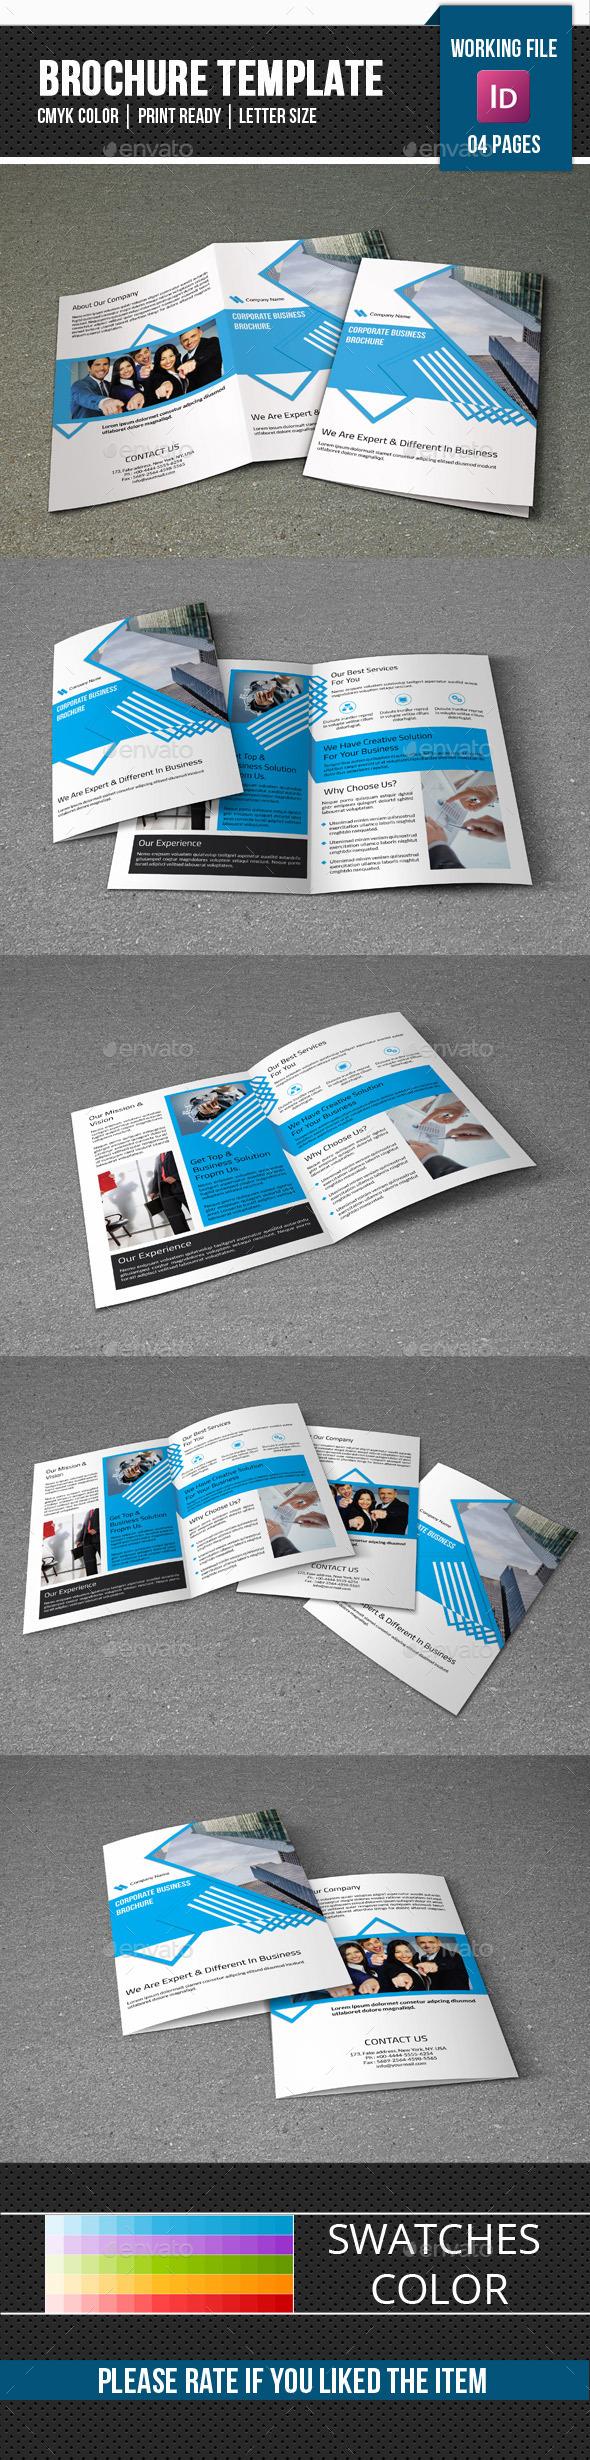 Corporate Brochure Template-V289 - Corporate Brochures